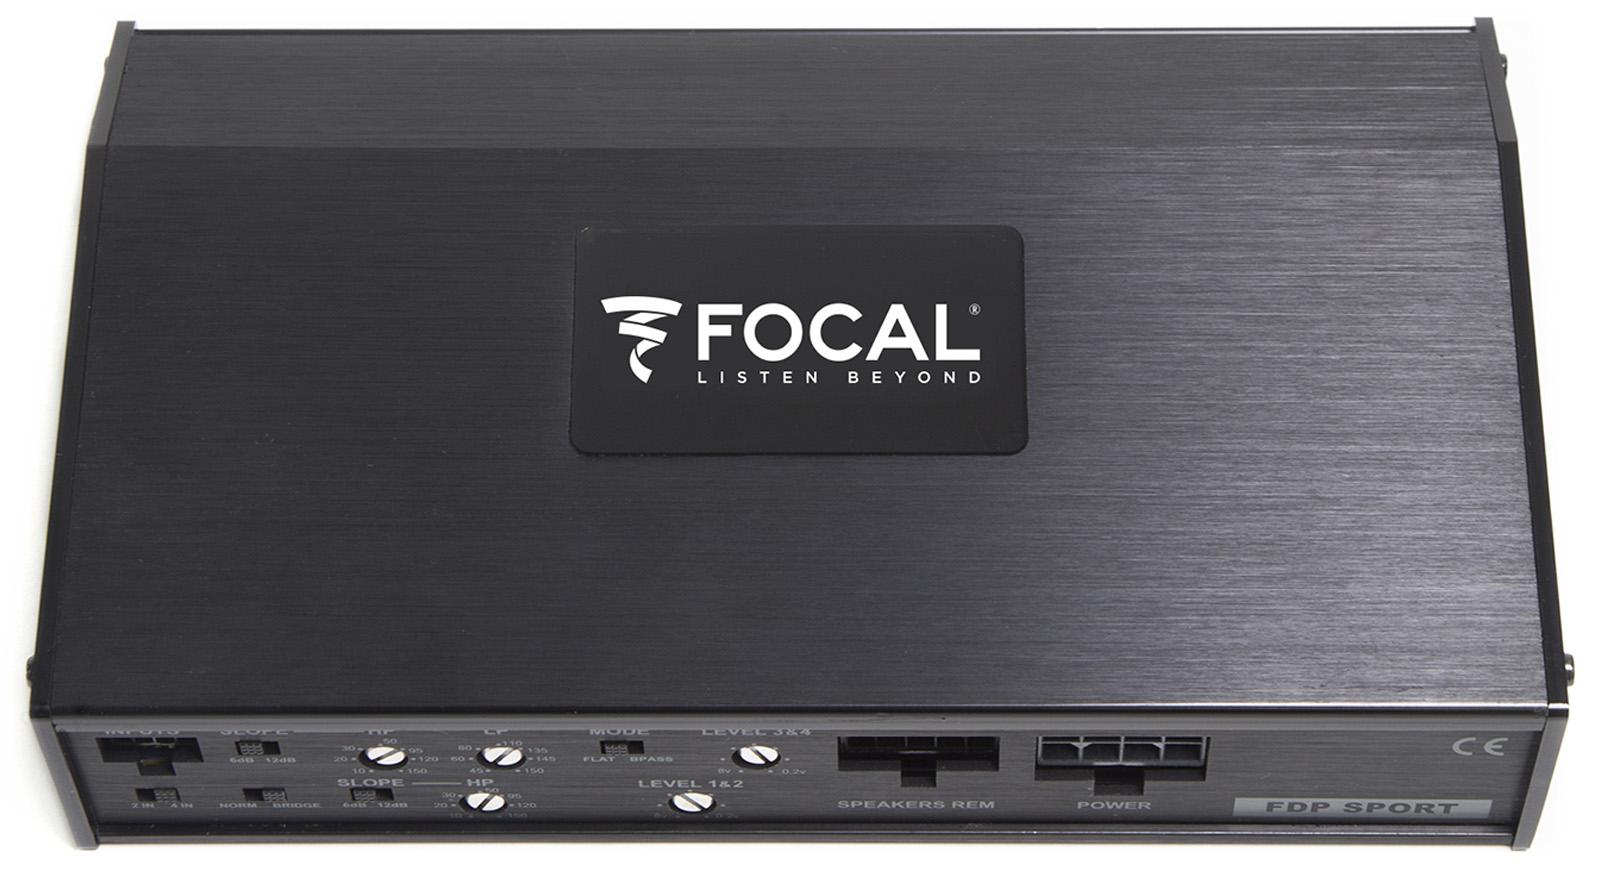 Focal Fdp Sport Amplifier Review